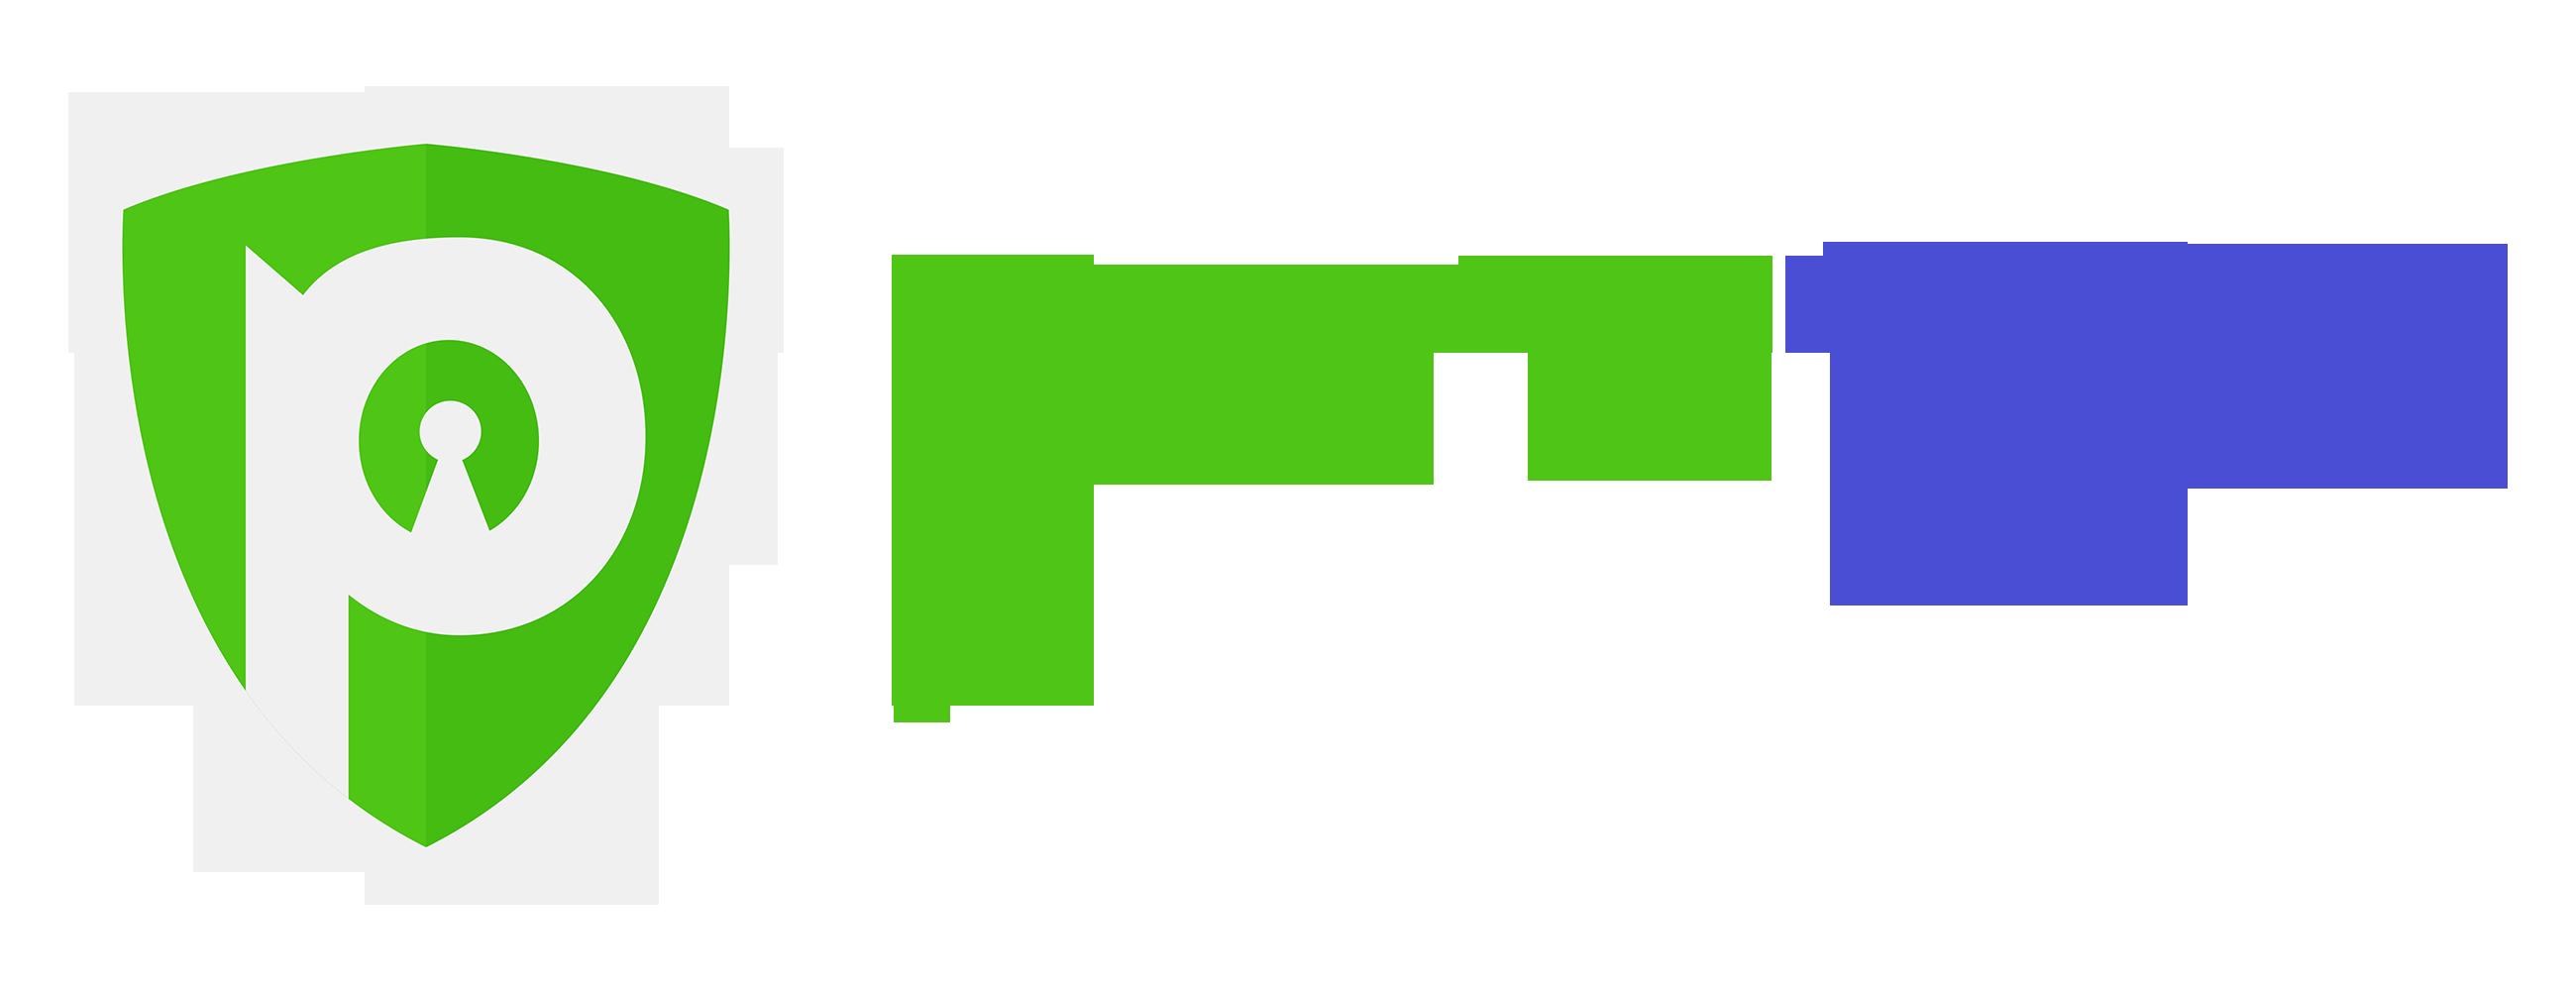 PureVPN Review 2015 - Get 75% Lifetime Discount Updated Sept